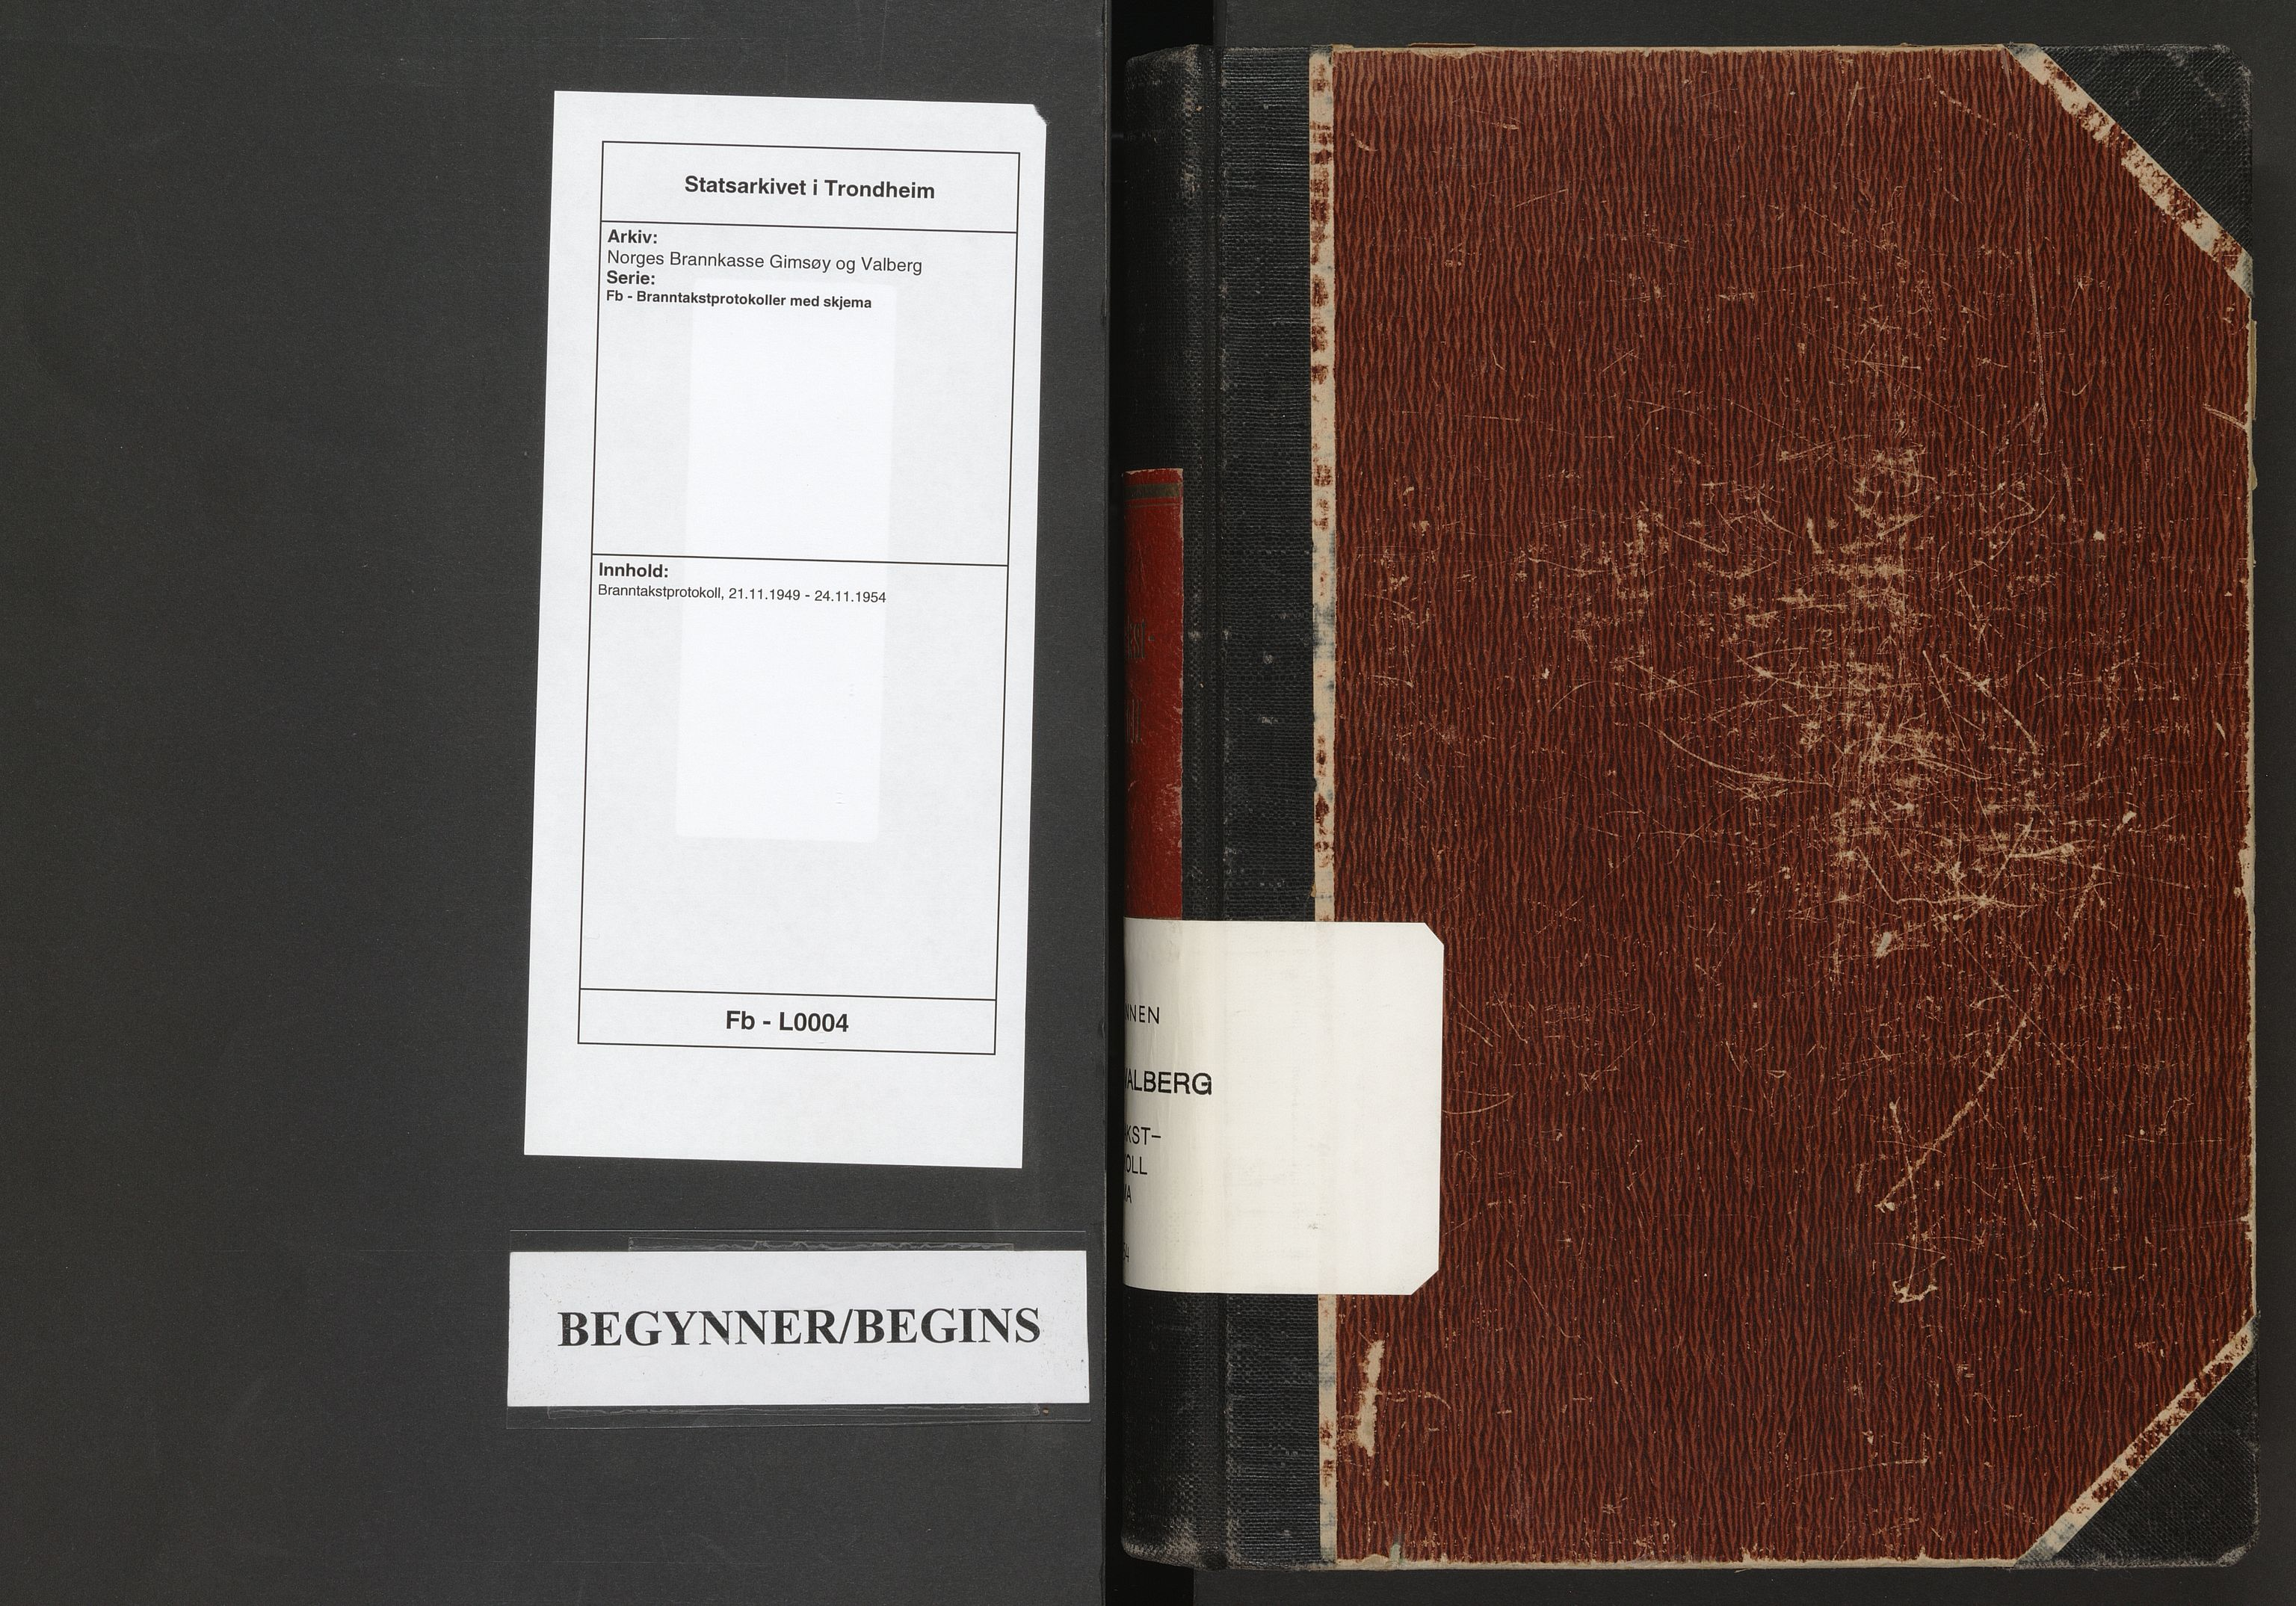 SAT, Norges Brannkasse Gimsøy og Valberg, Fb/L0004: Branntakstprotokoll, 1949-1954